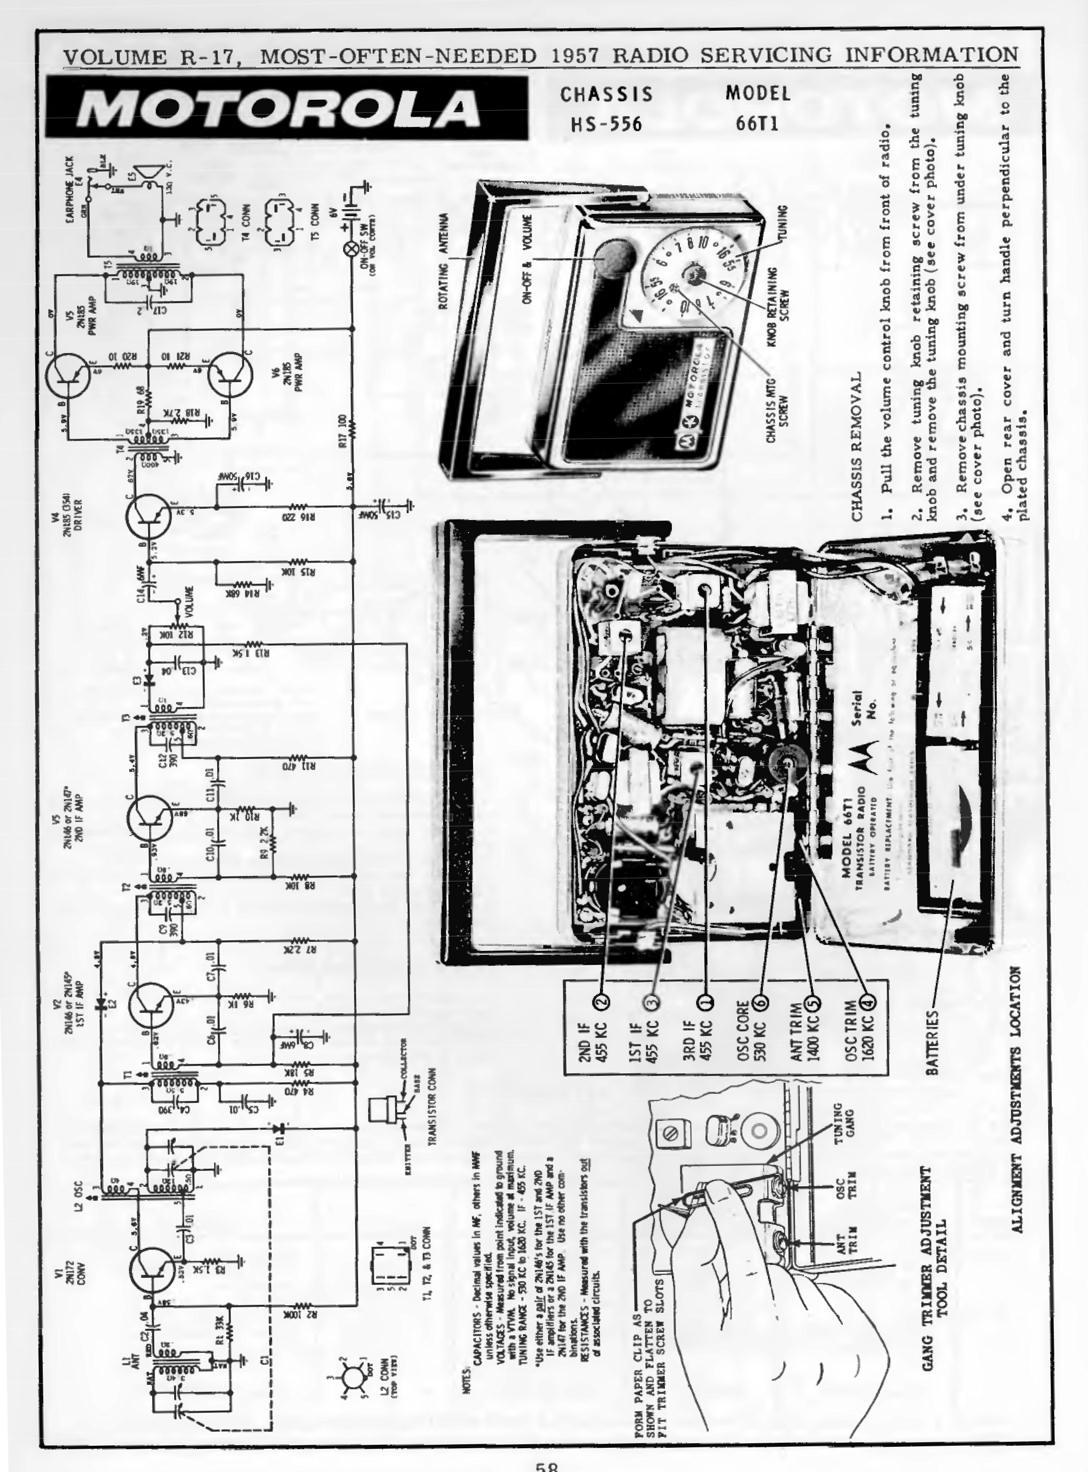 Motorola Model 66T1 Transistor Radio (1957)